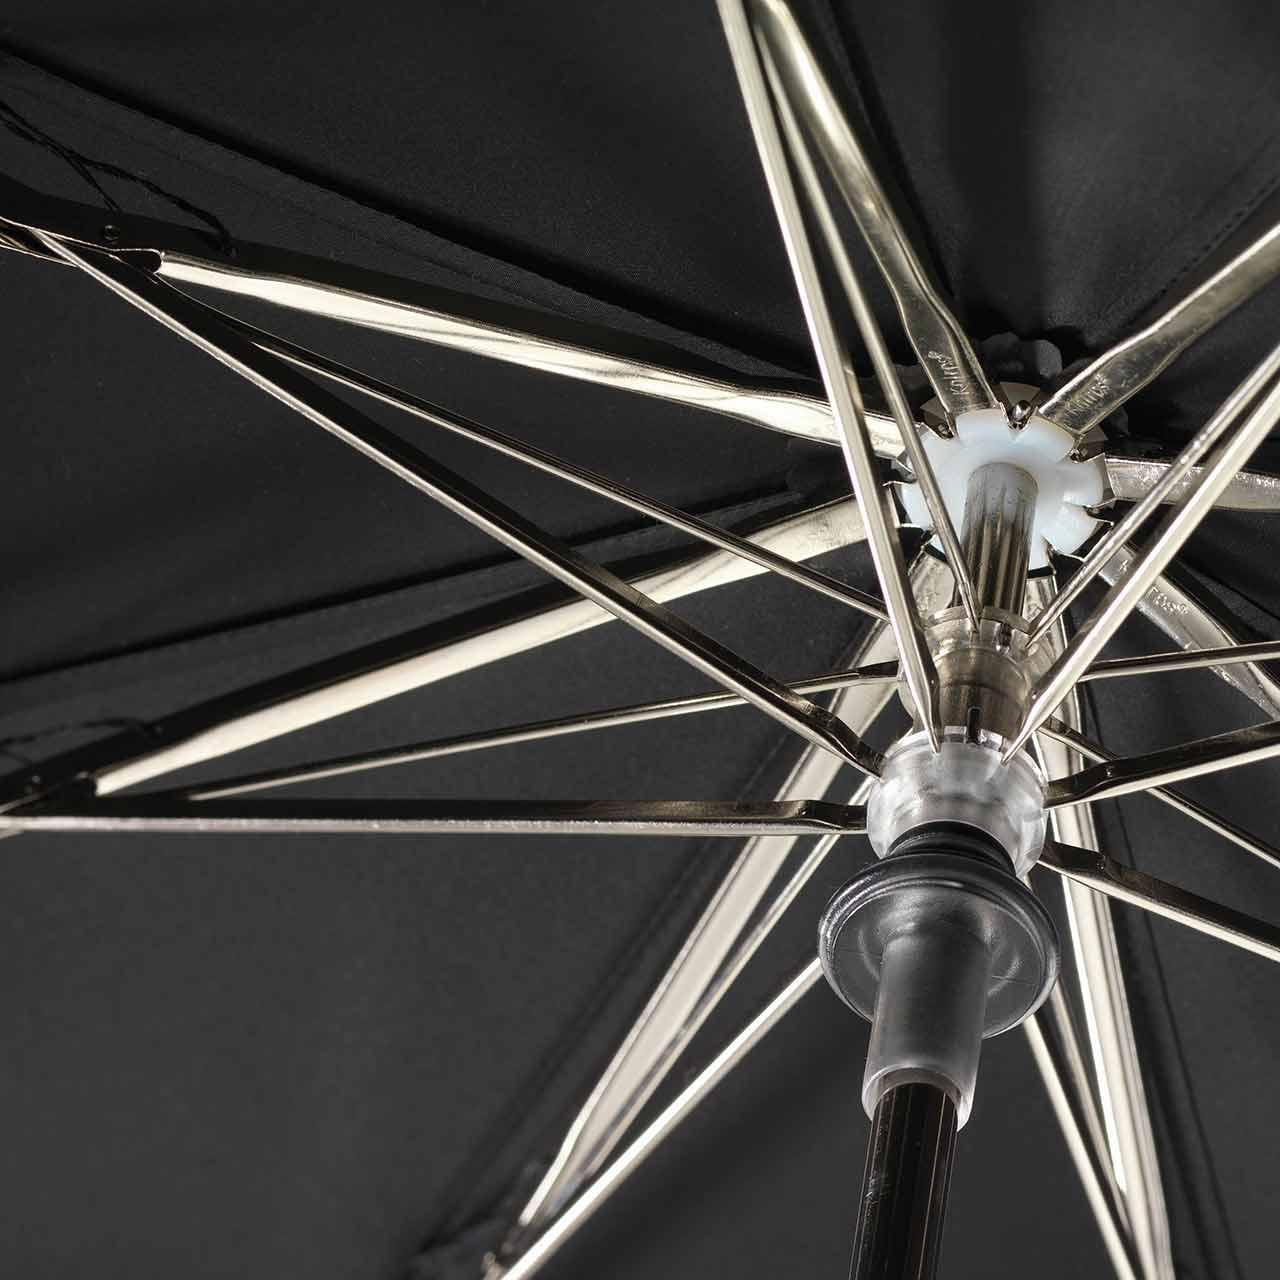 KNIRPS pocket umbrella Topmatic SL 826 Black | the design gift shop